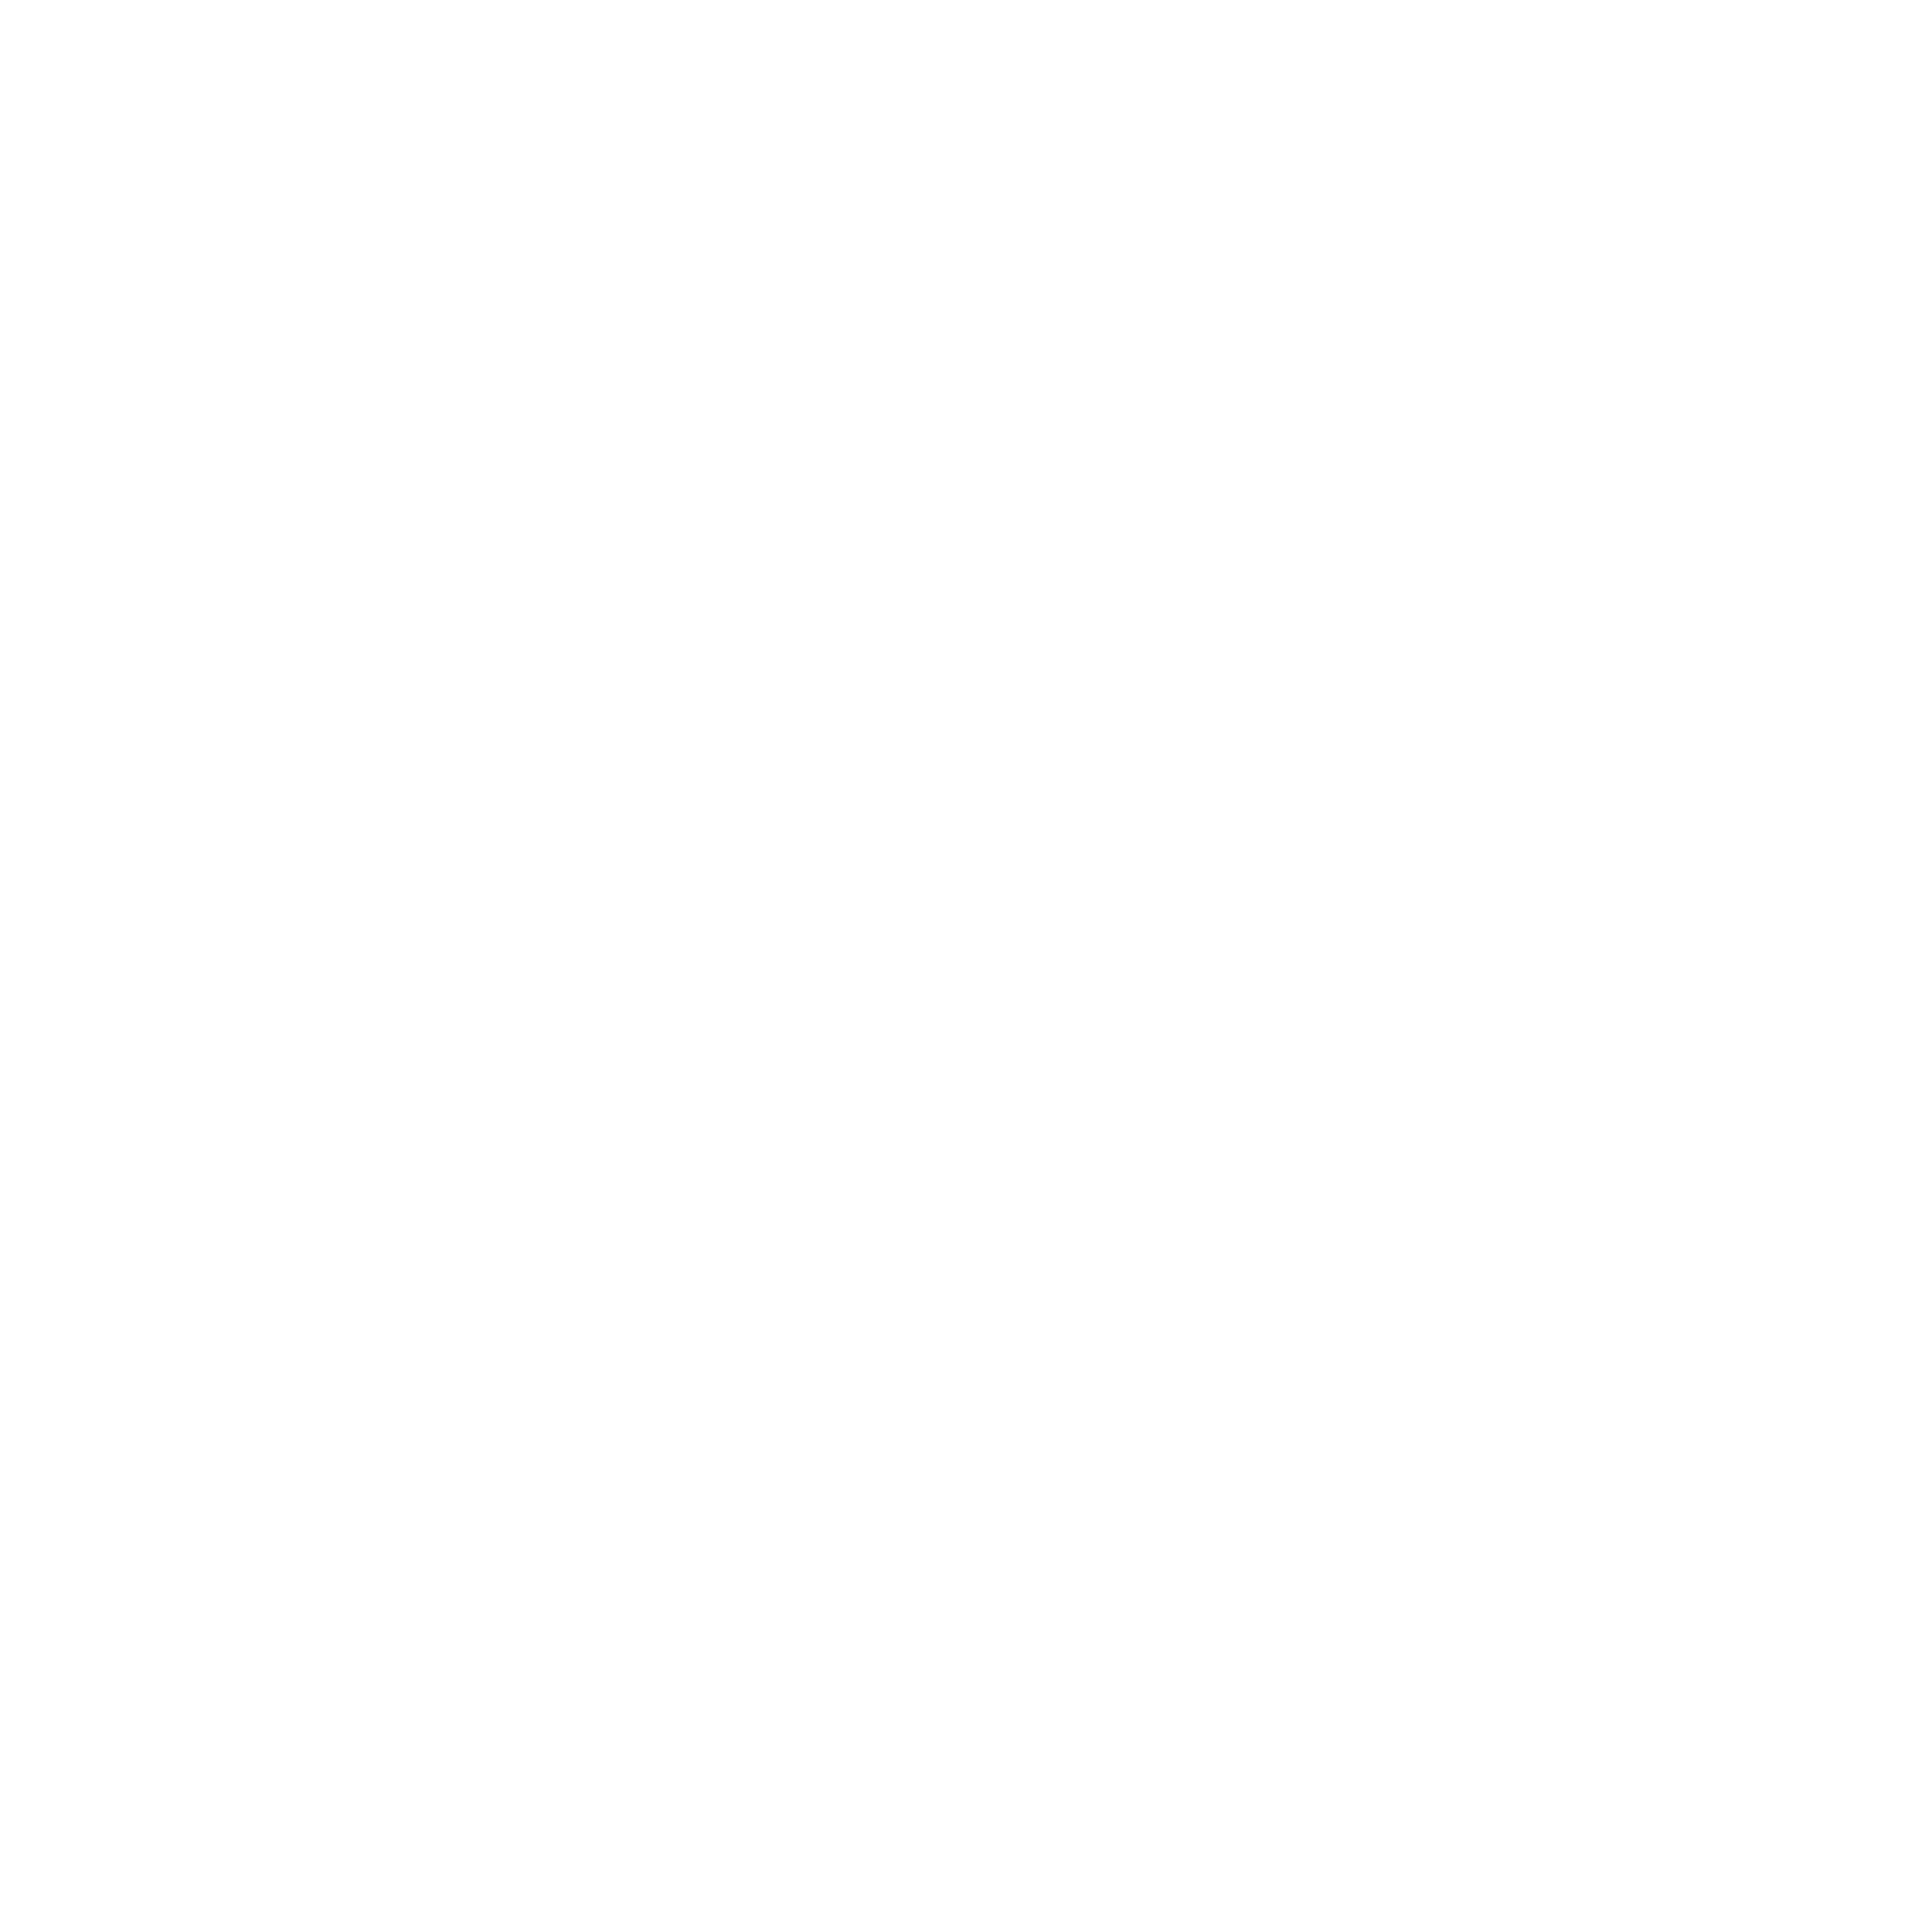 logo-white-landscape-notext